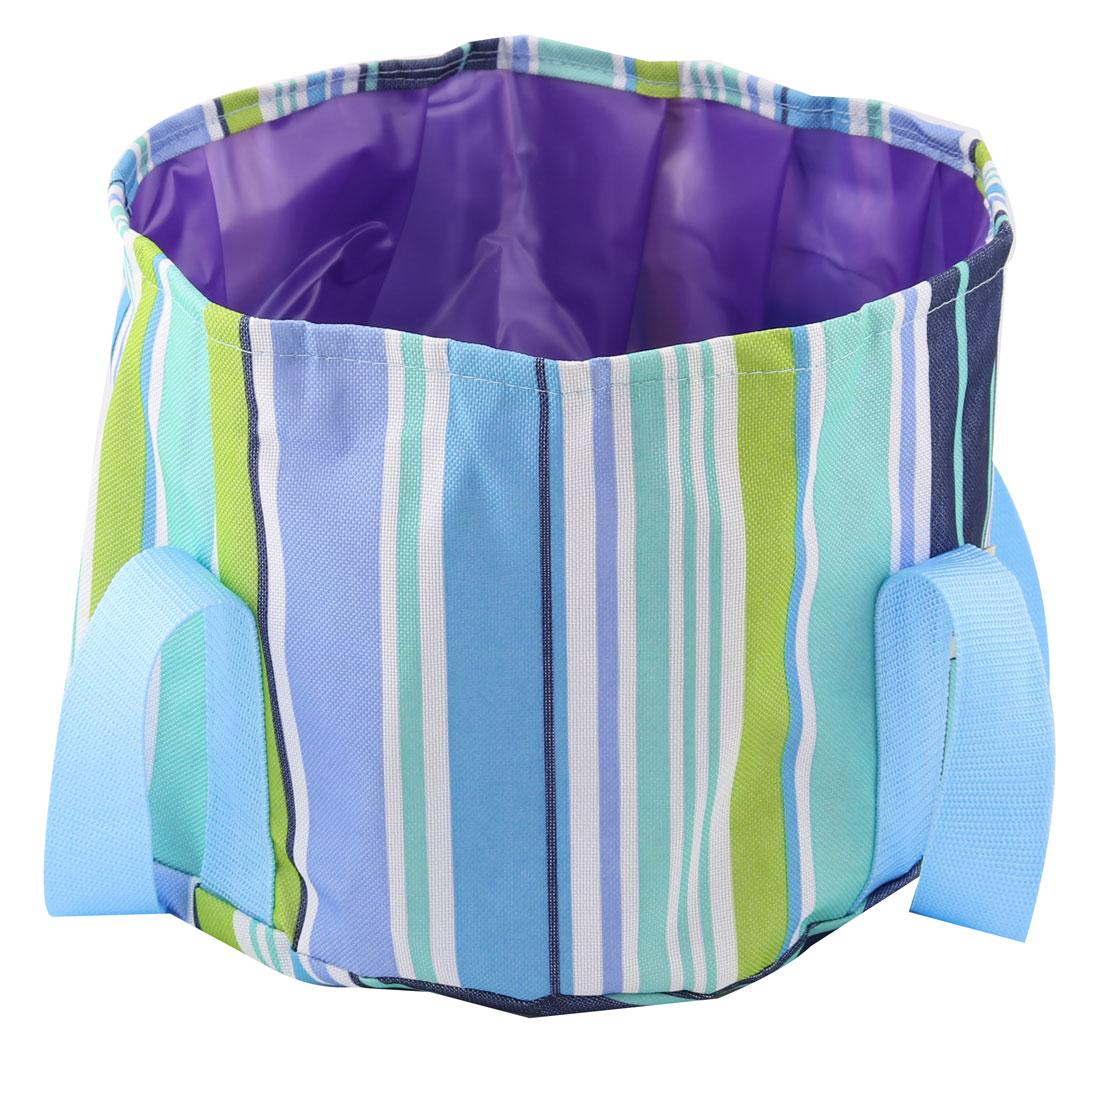 Outdoor Stripe Pattern Portable Foldaway Fishing Barrel Water Storage Bucket Washbasin Blue